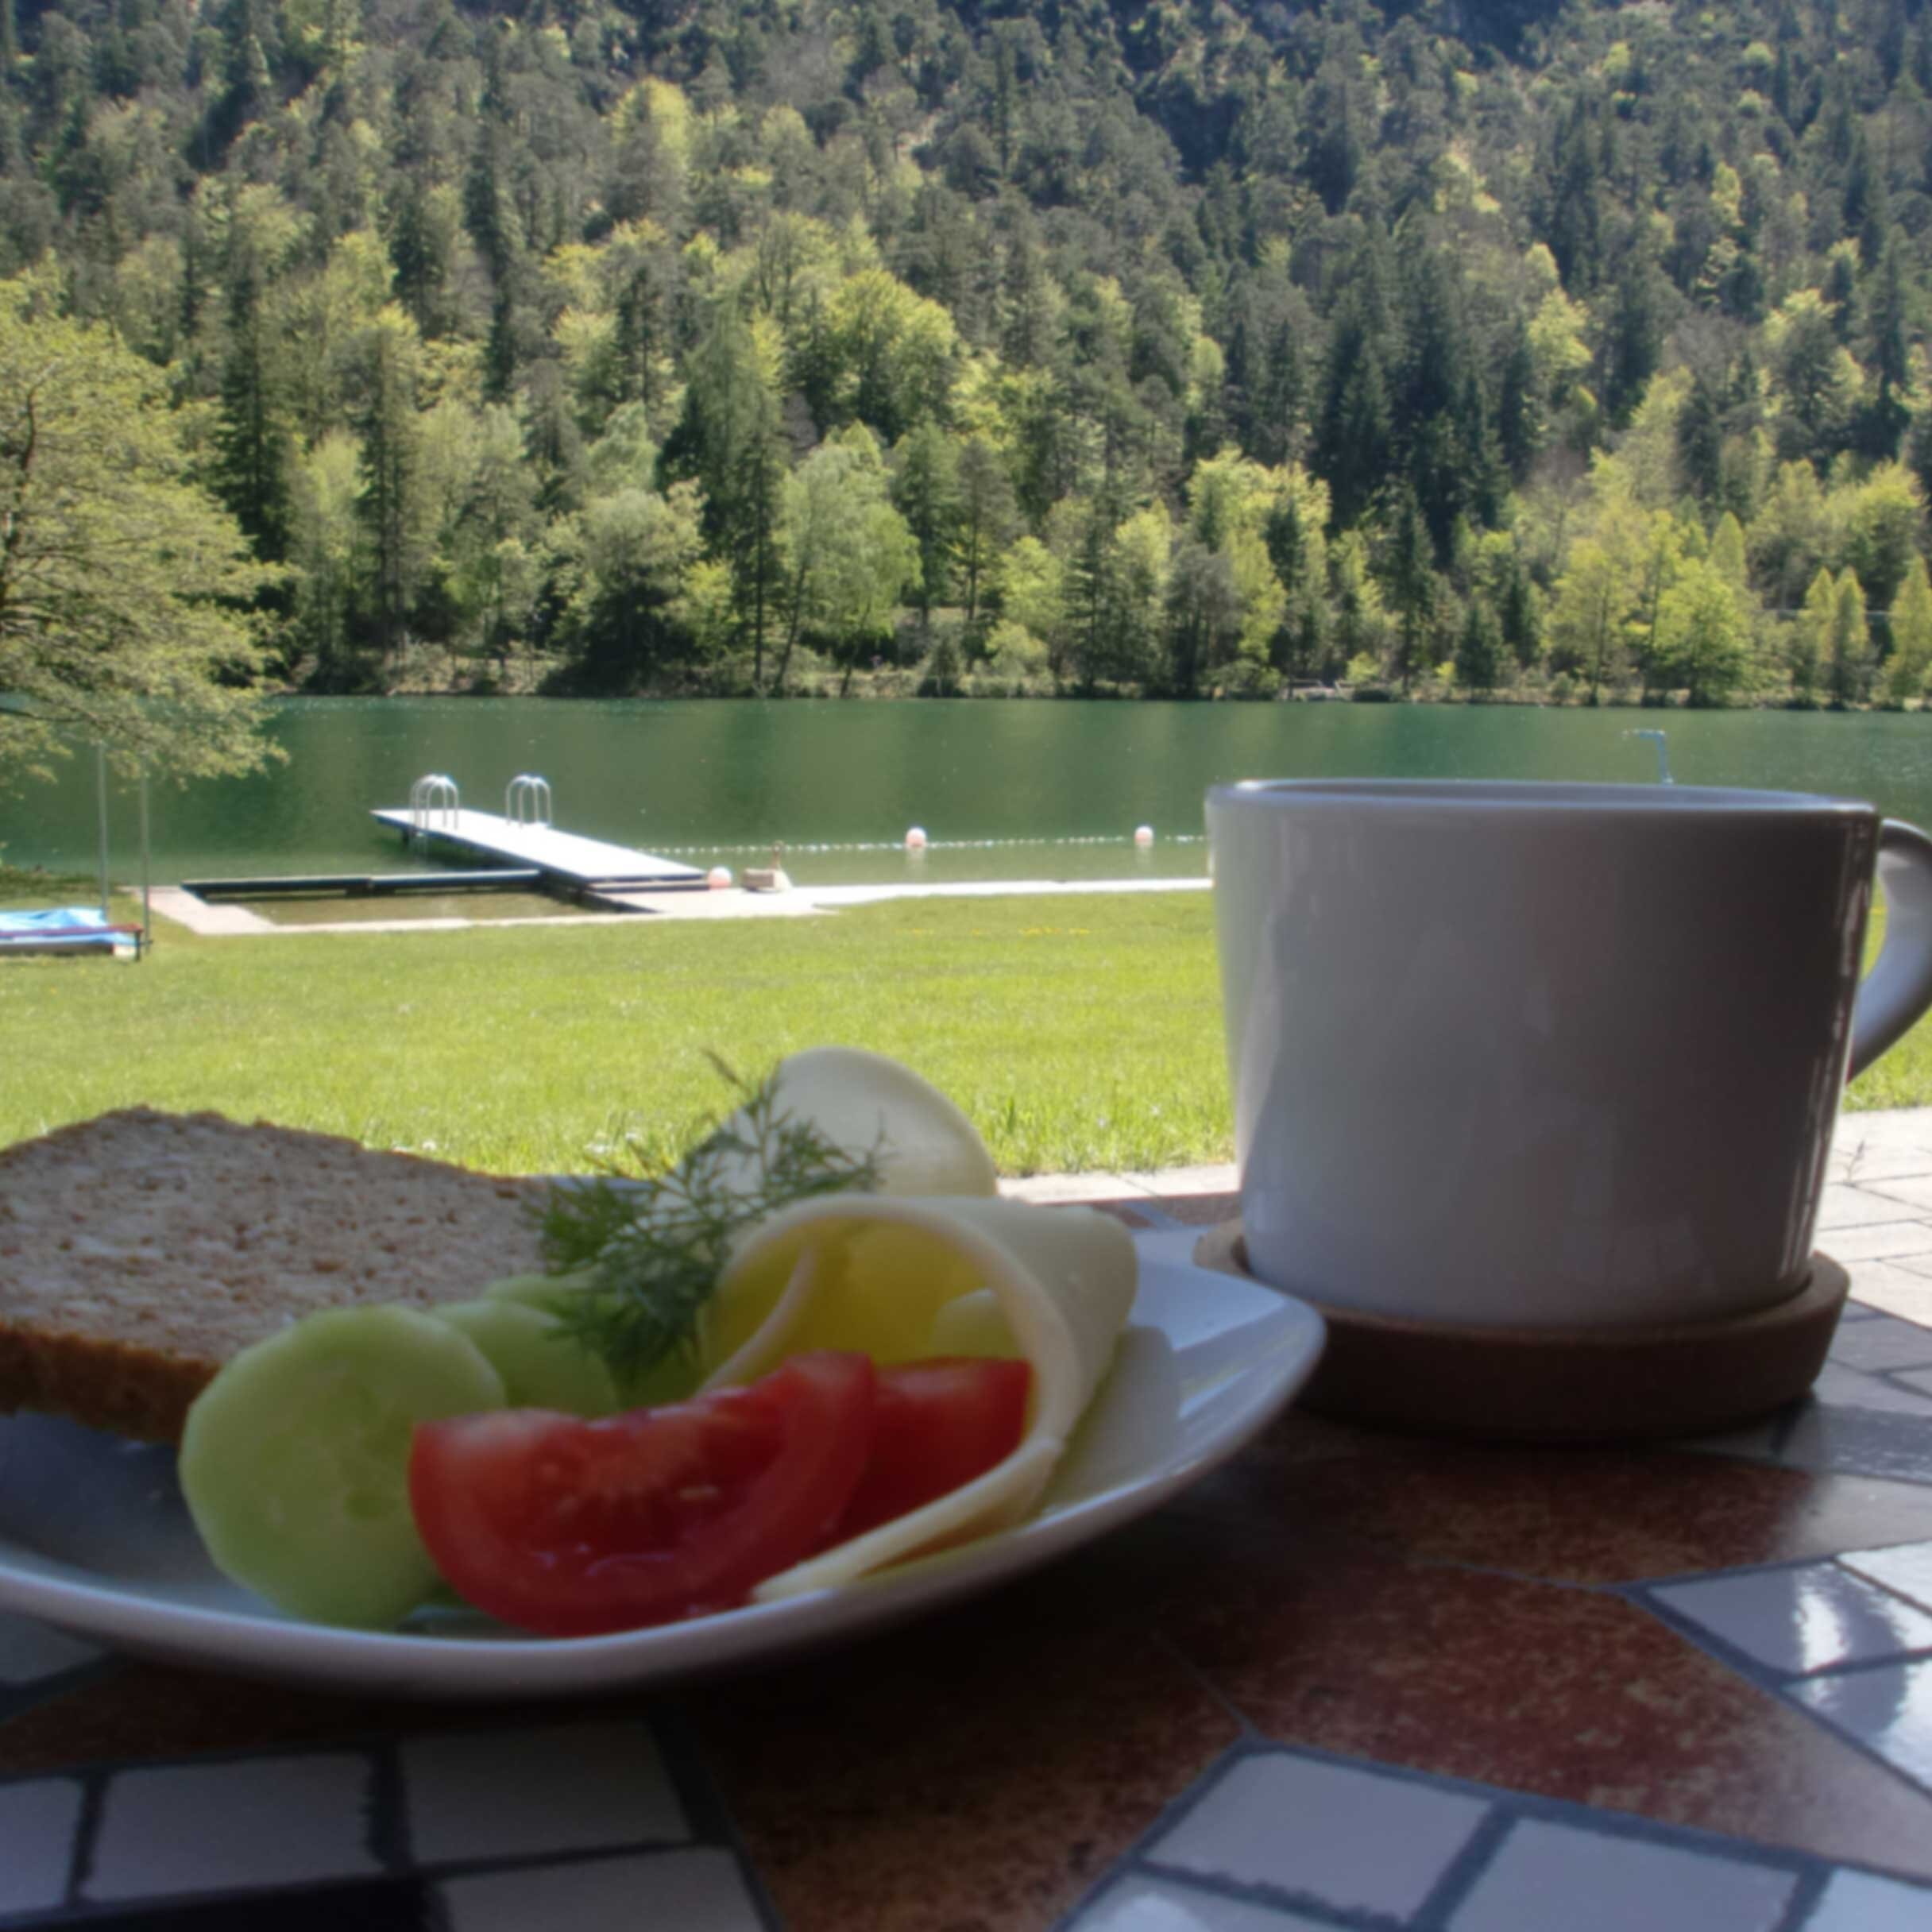 Morgenyoga und Frühstück im Thumseebad